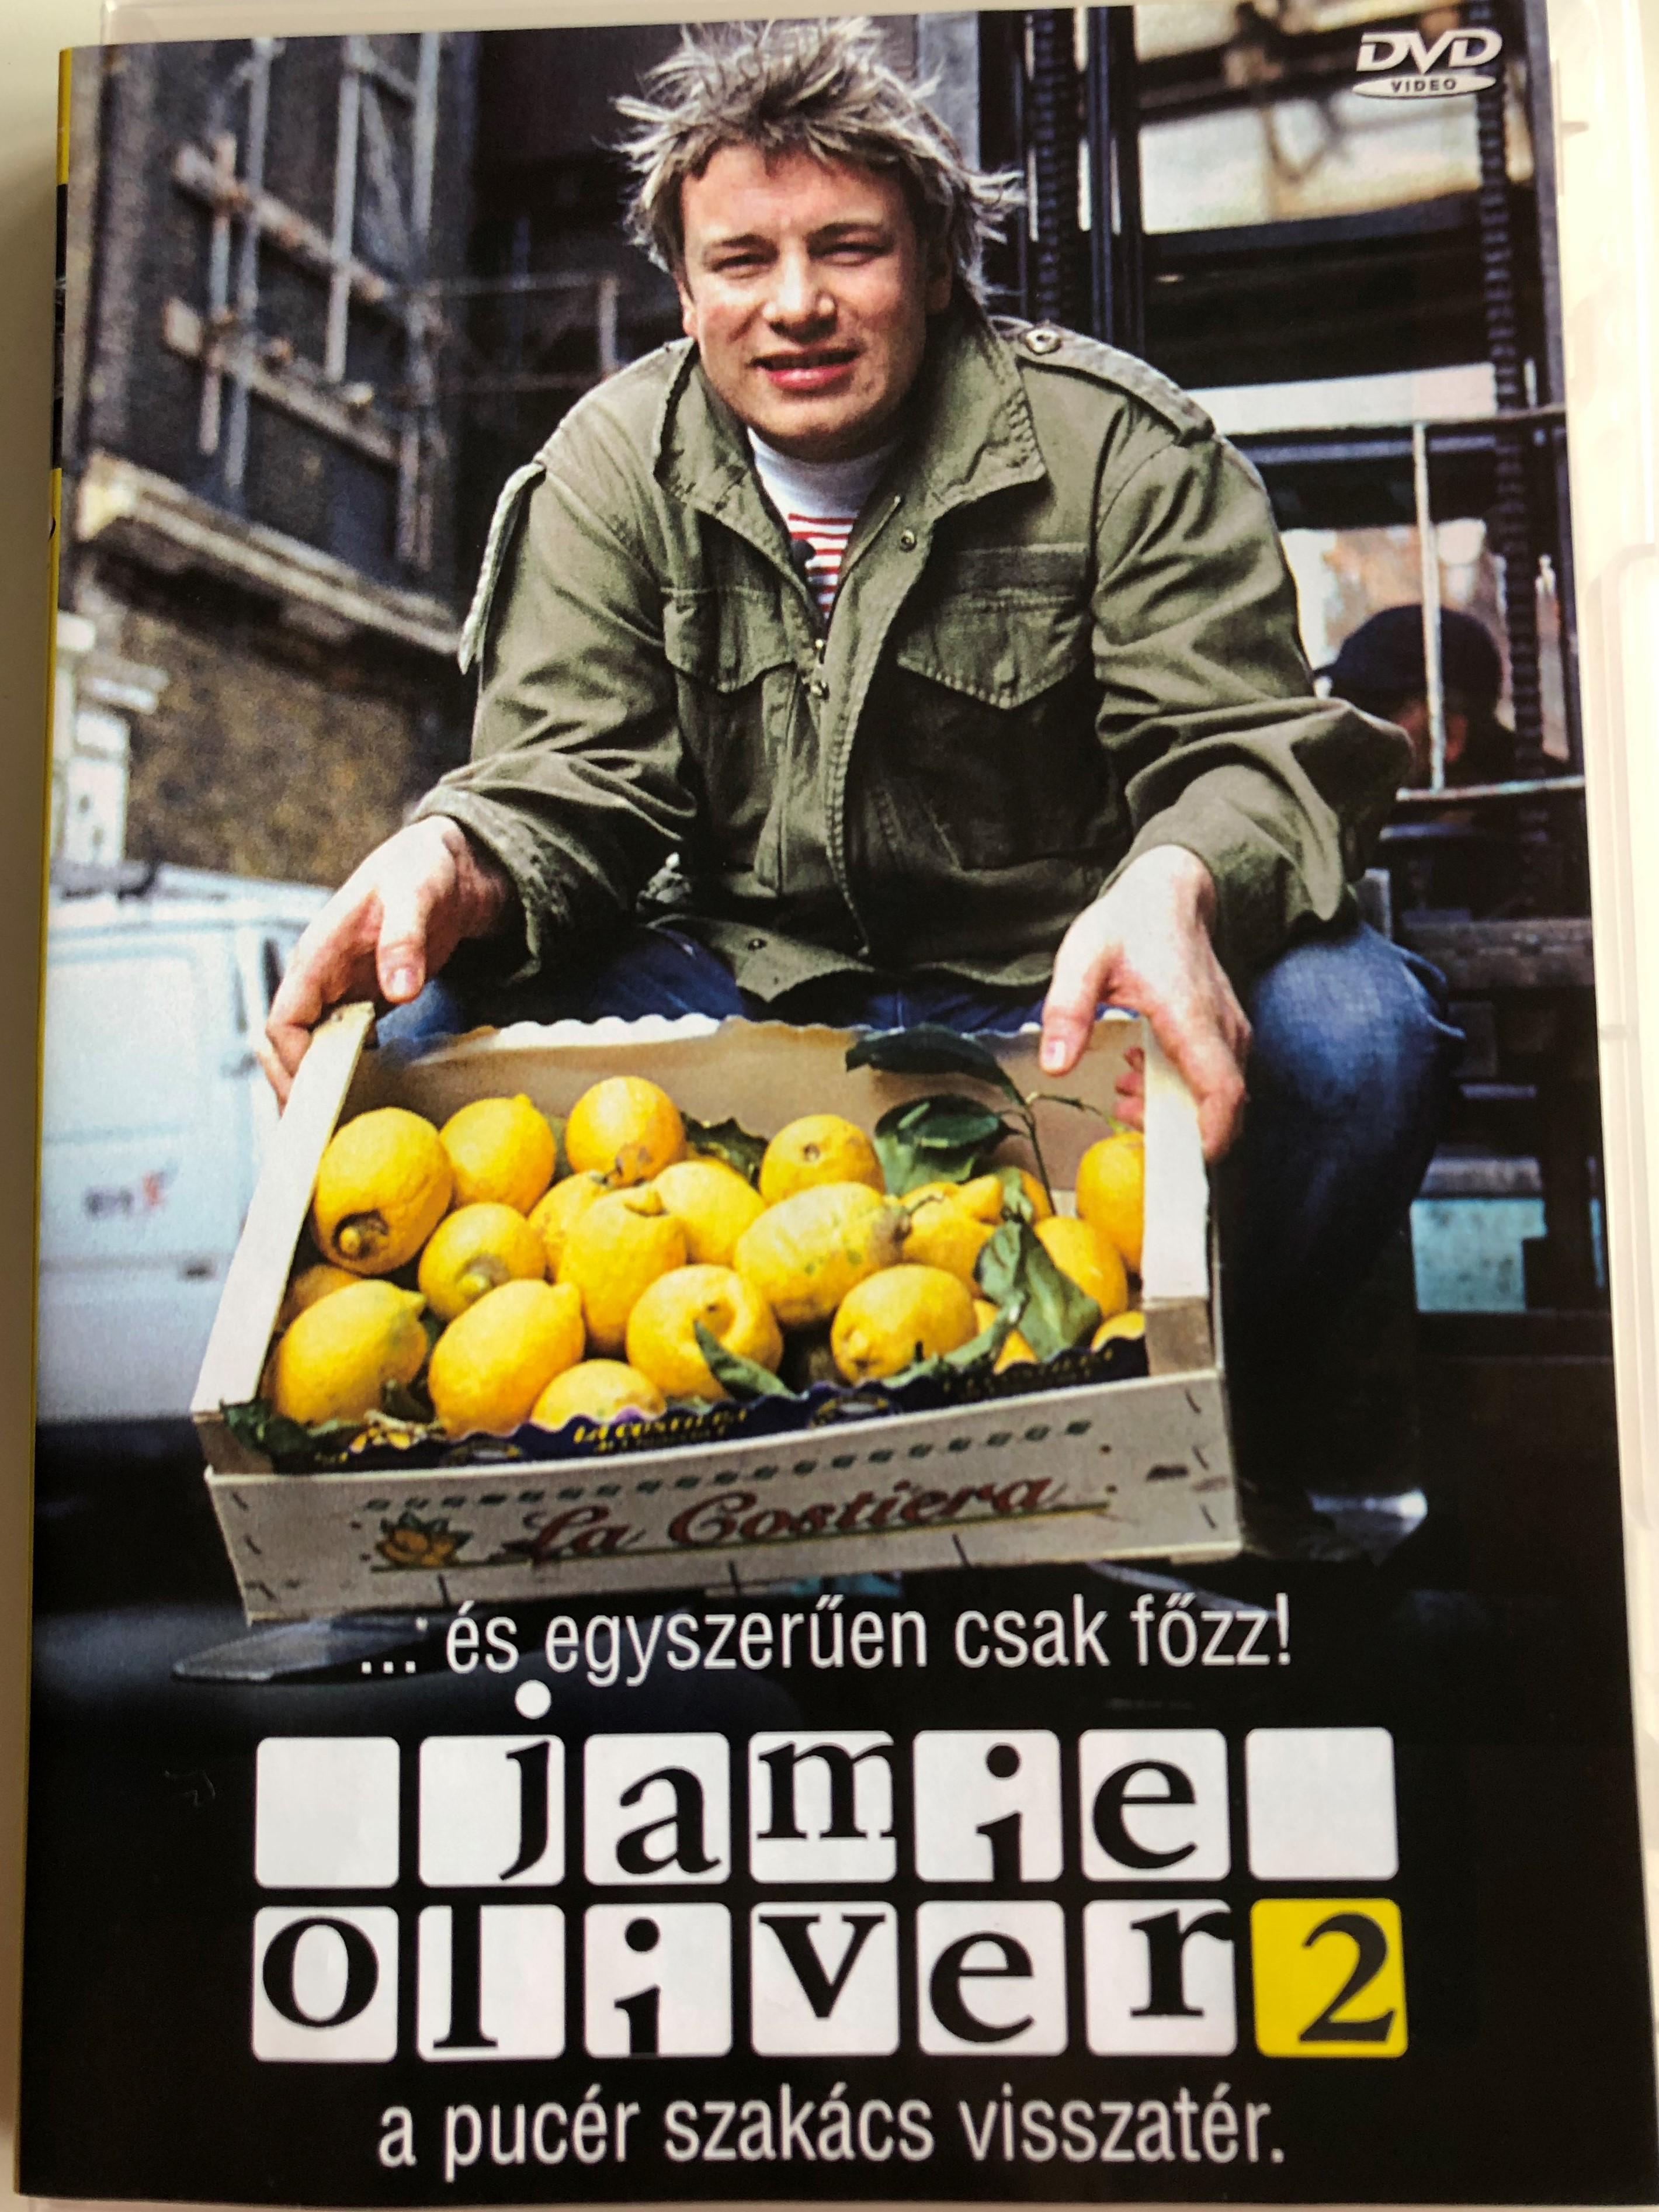 -oliver-s-twist-dvd-2002-jamie-oliver-vol.-2-1.jpg